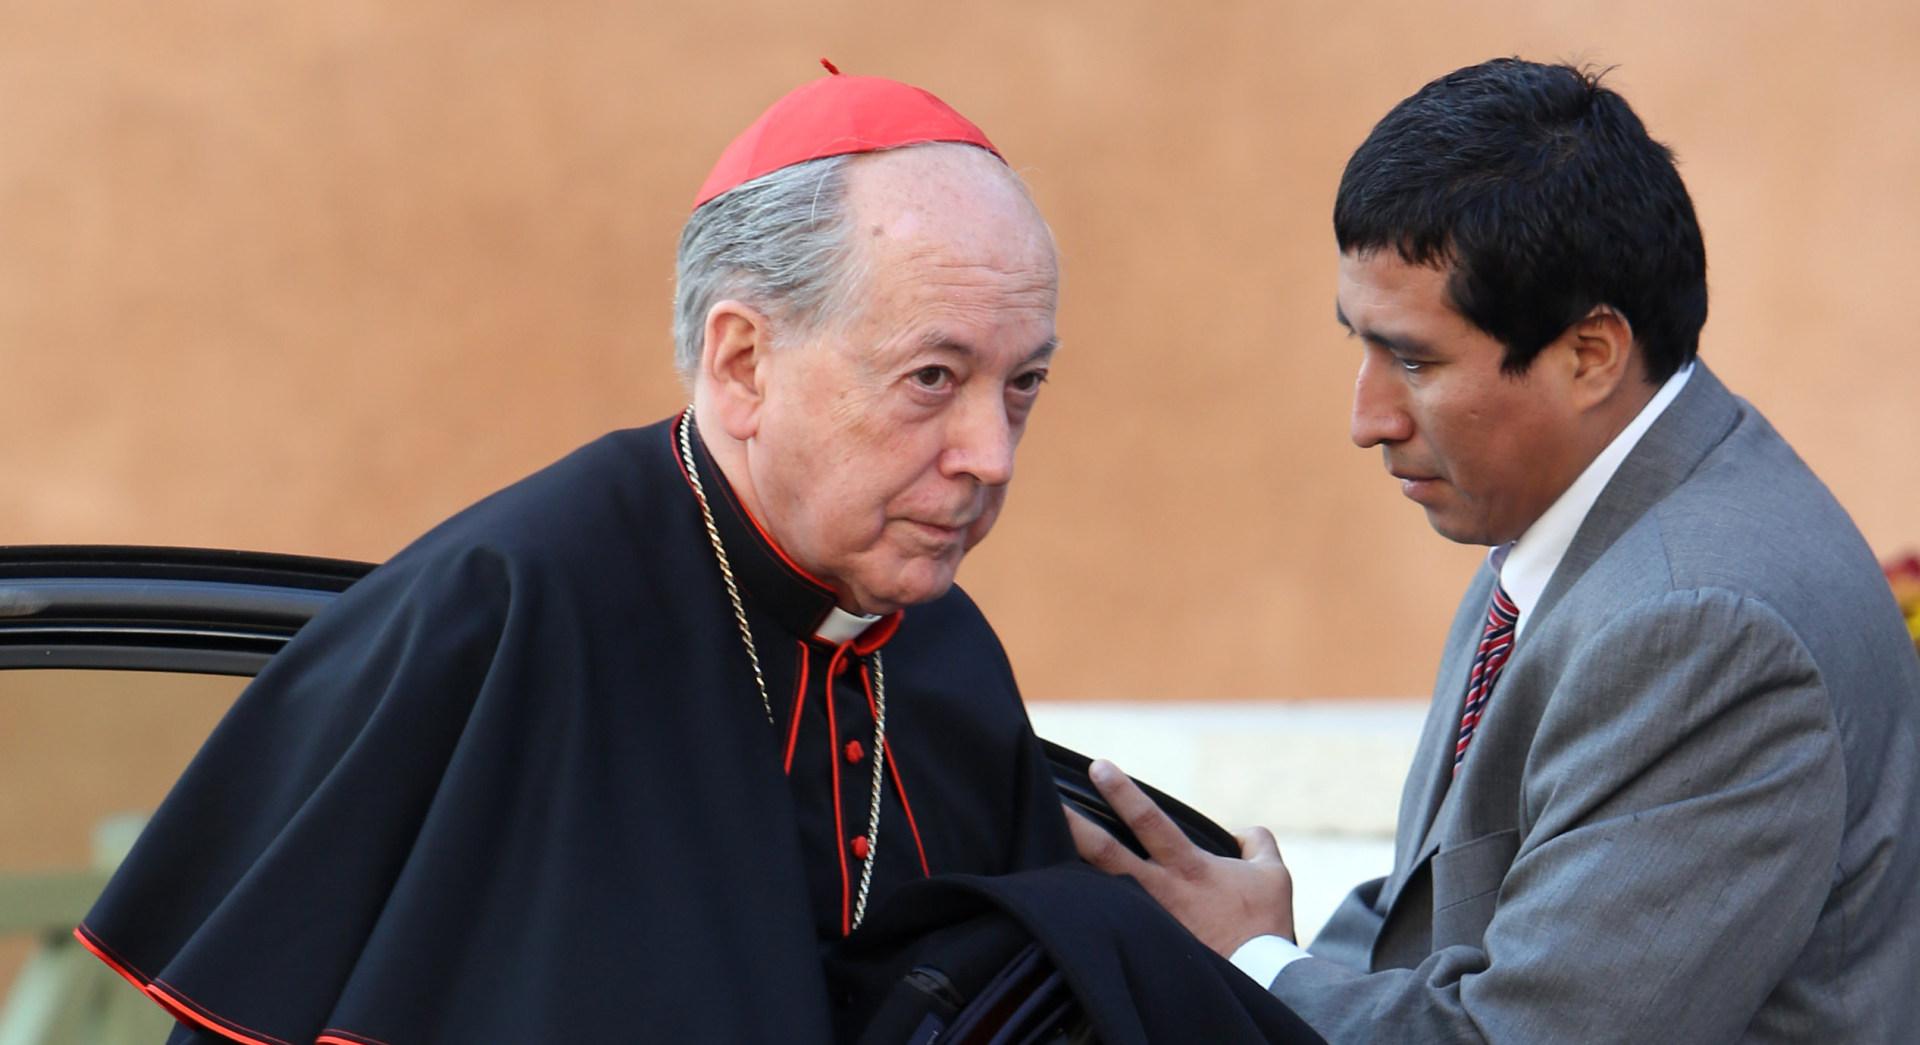 NADBISKUP PLAGIJATOR Peruanski kardinal prepisivao od papa